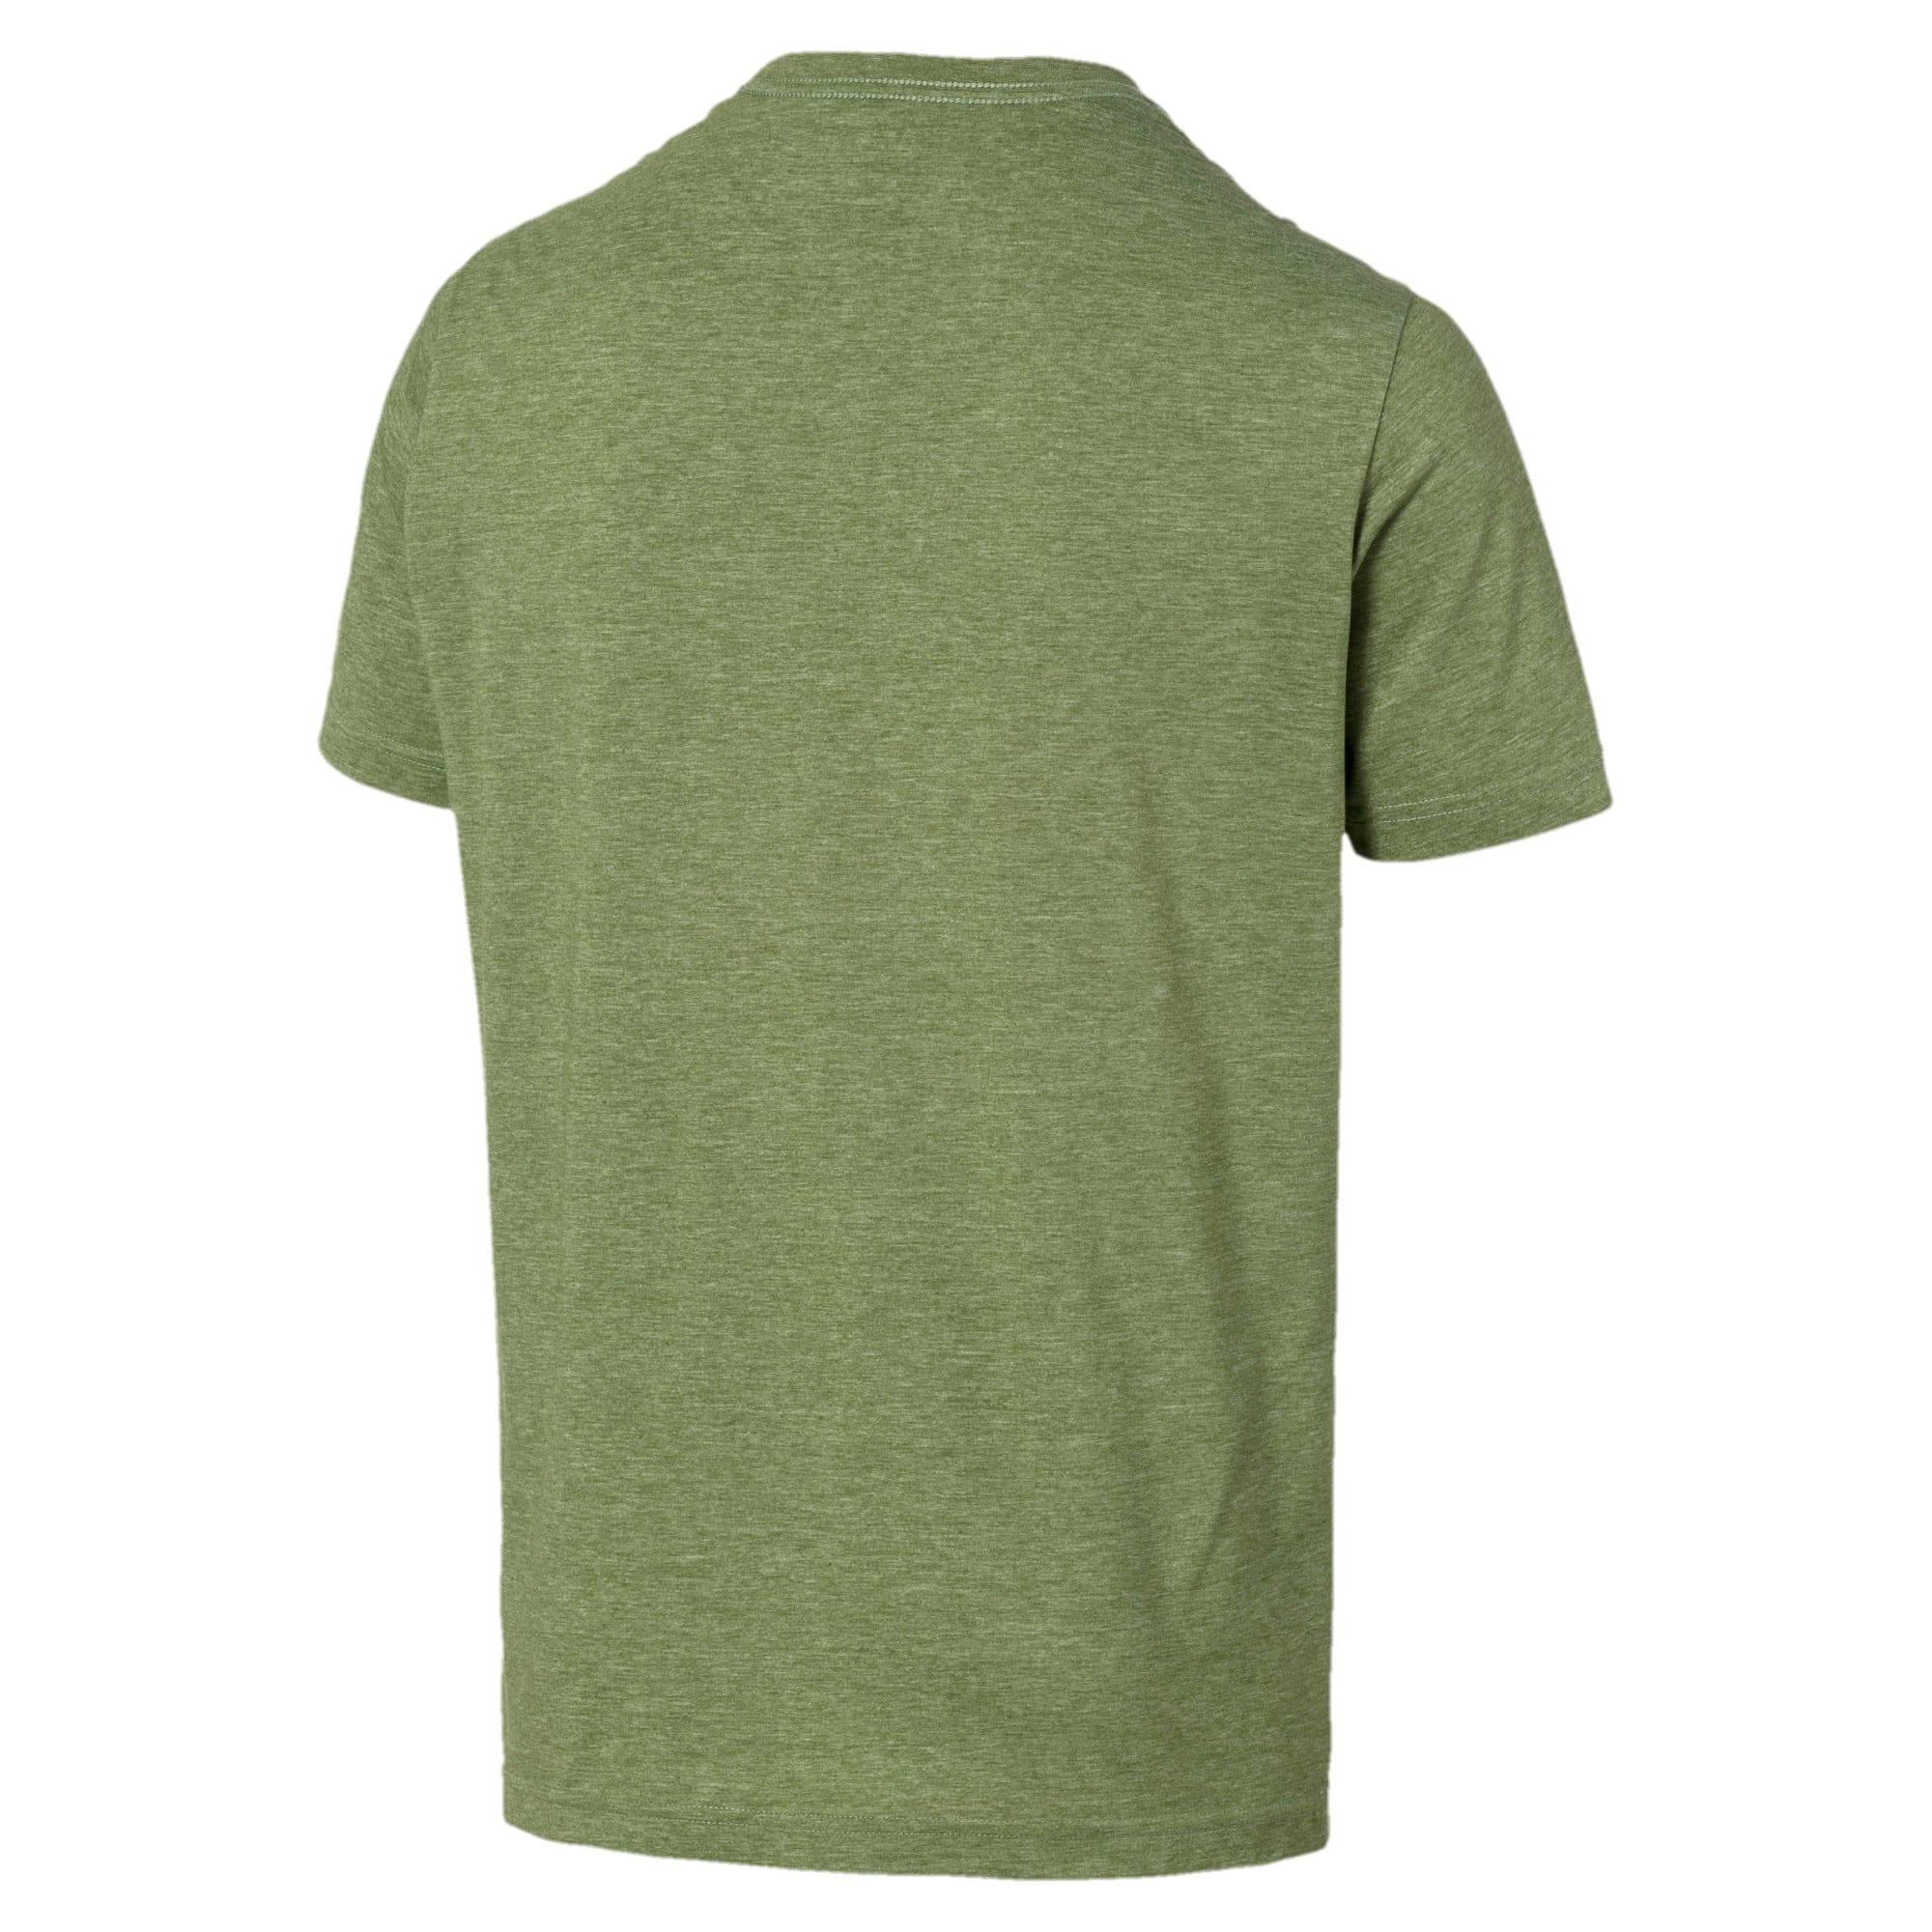 Thumbnail 5 of Indispensabili+ T-shirt mélange uomo, Garden Green Heather, medium